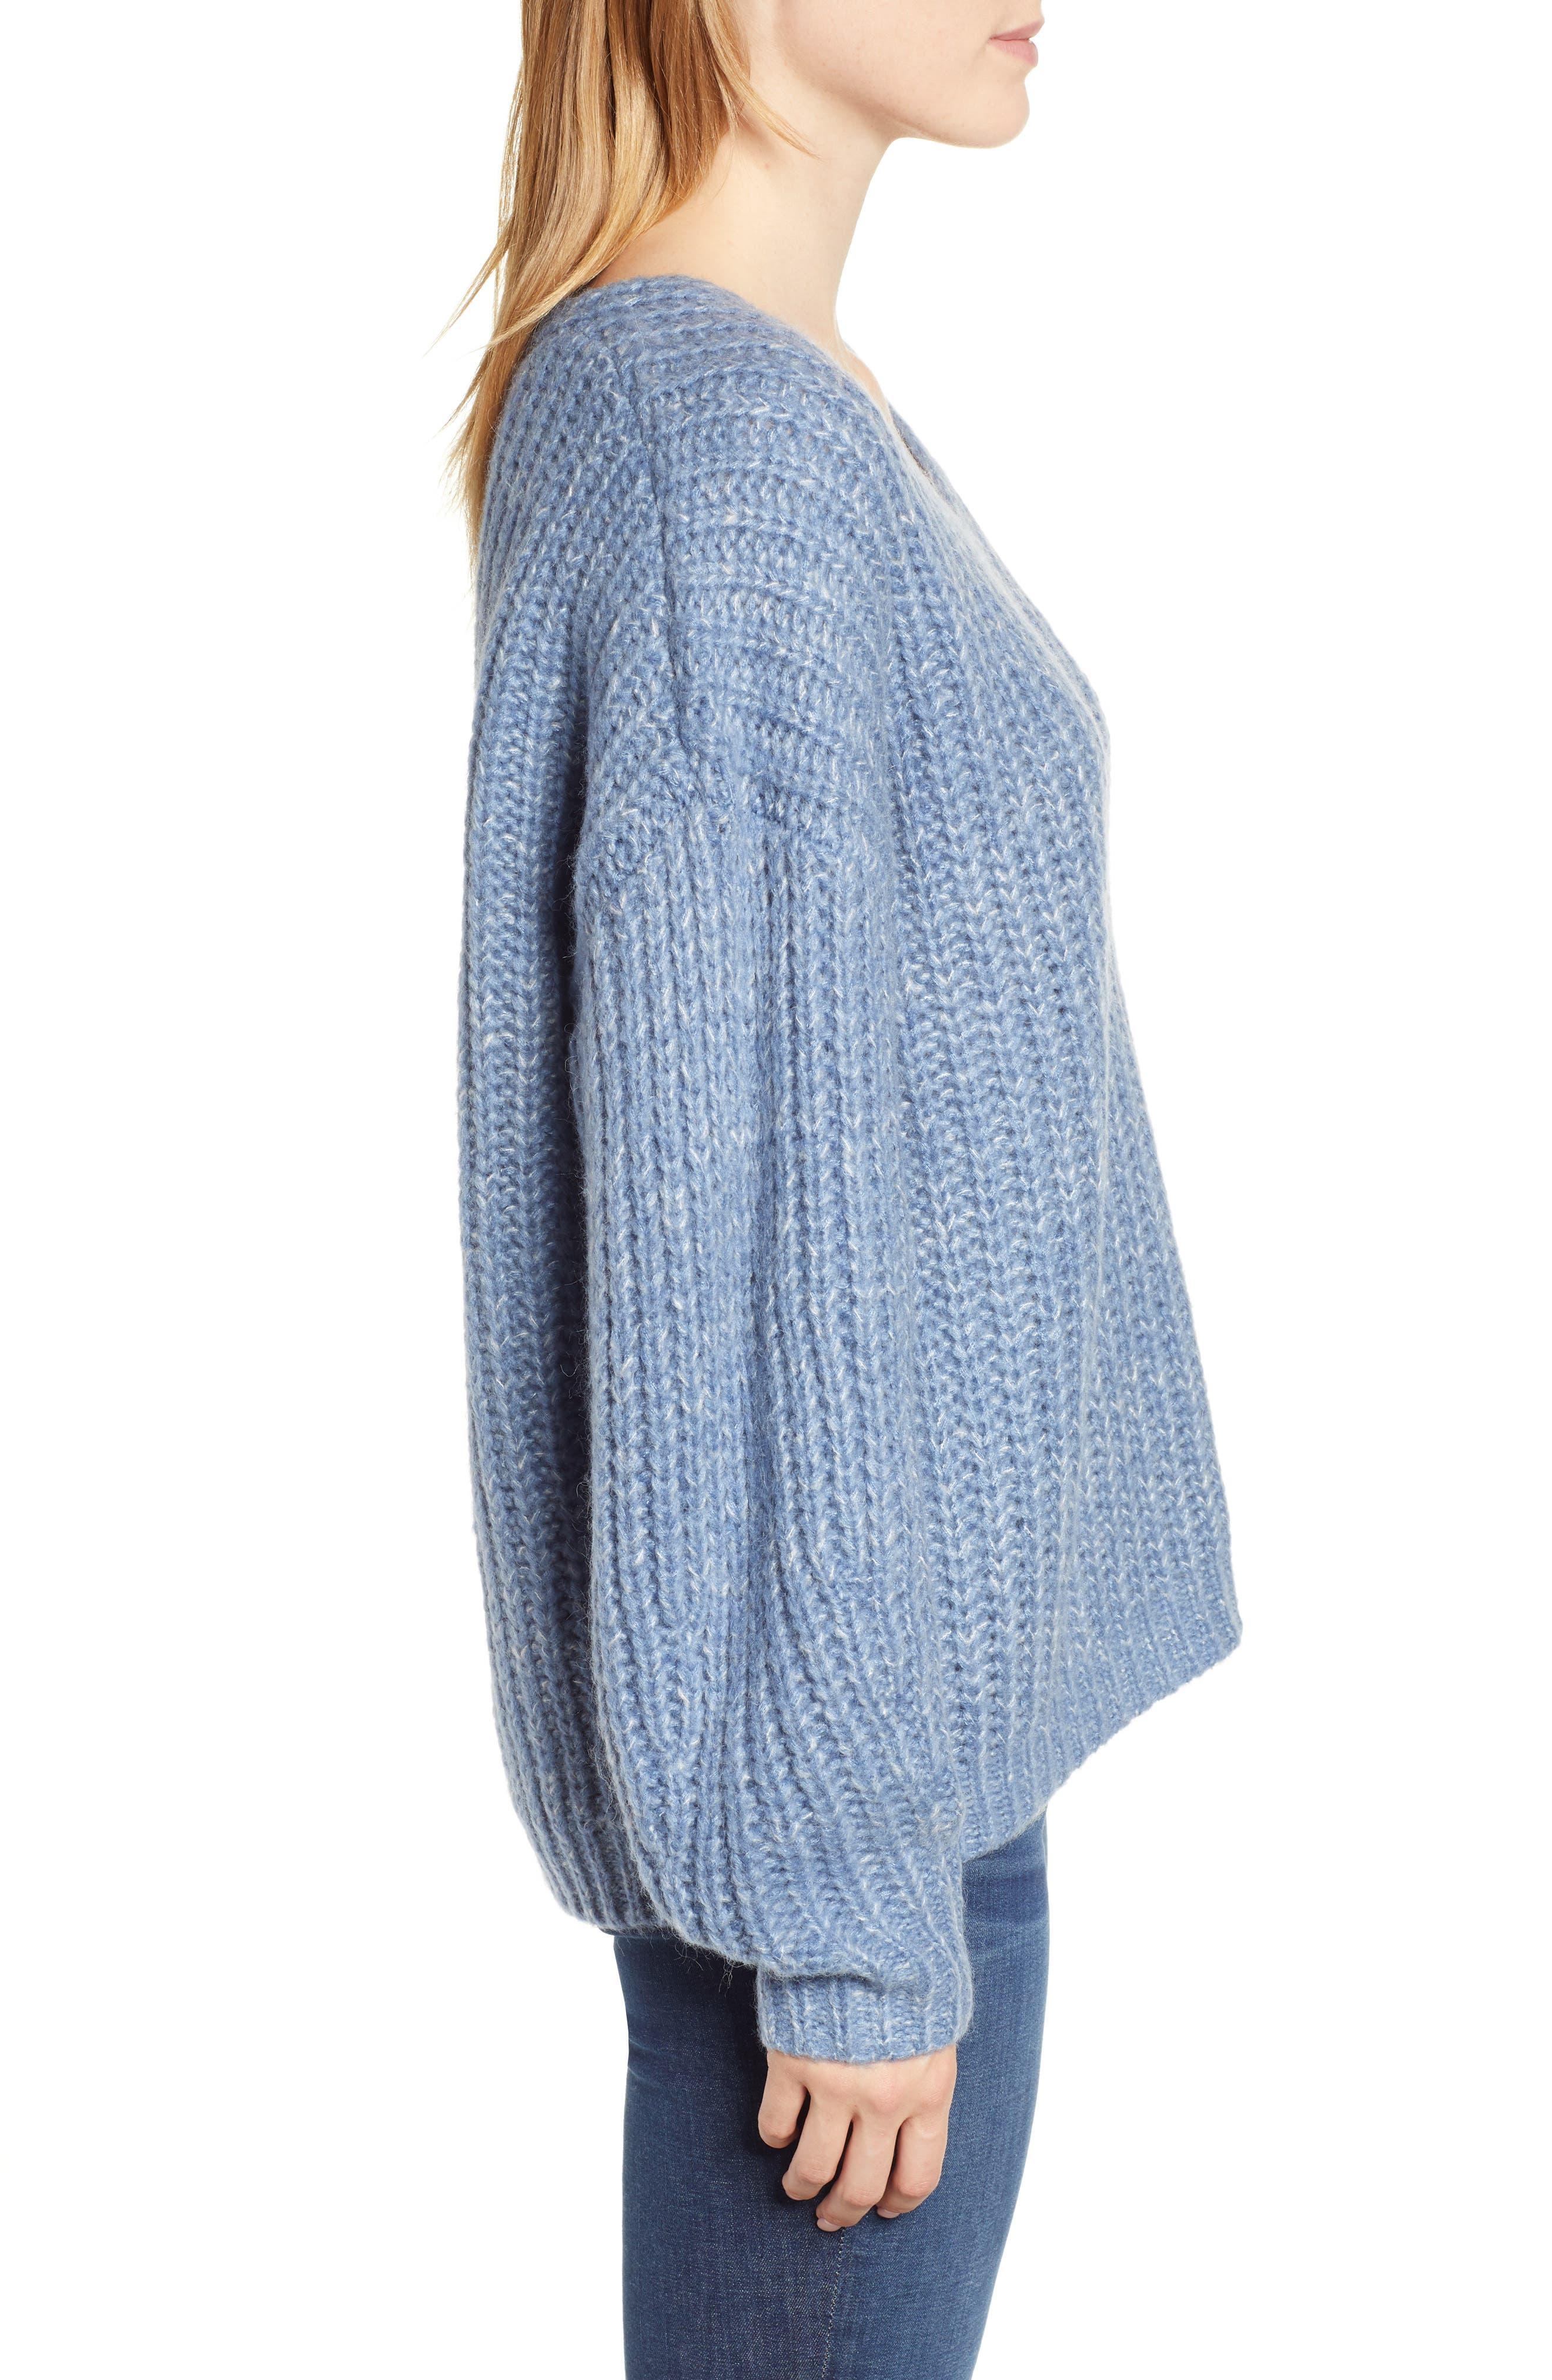 Dorit Sweater,                             Alternate thumbnail 3, color,                             BLUE